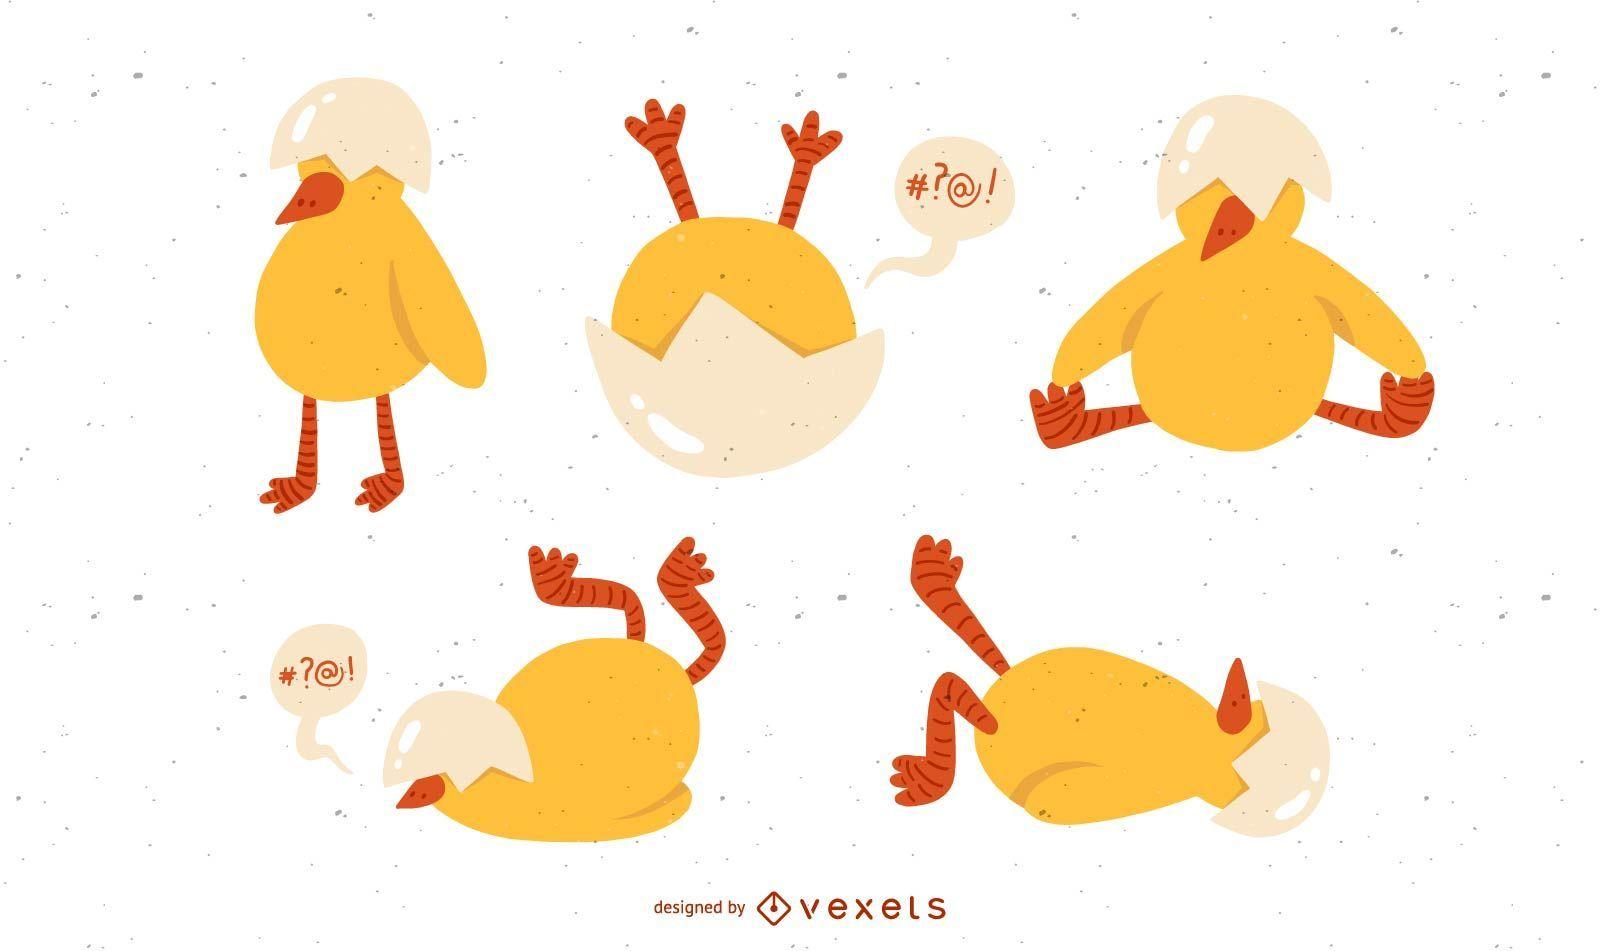 Nettes Hühnerillustrationsset